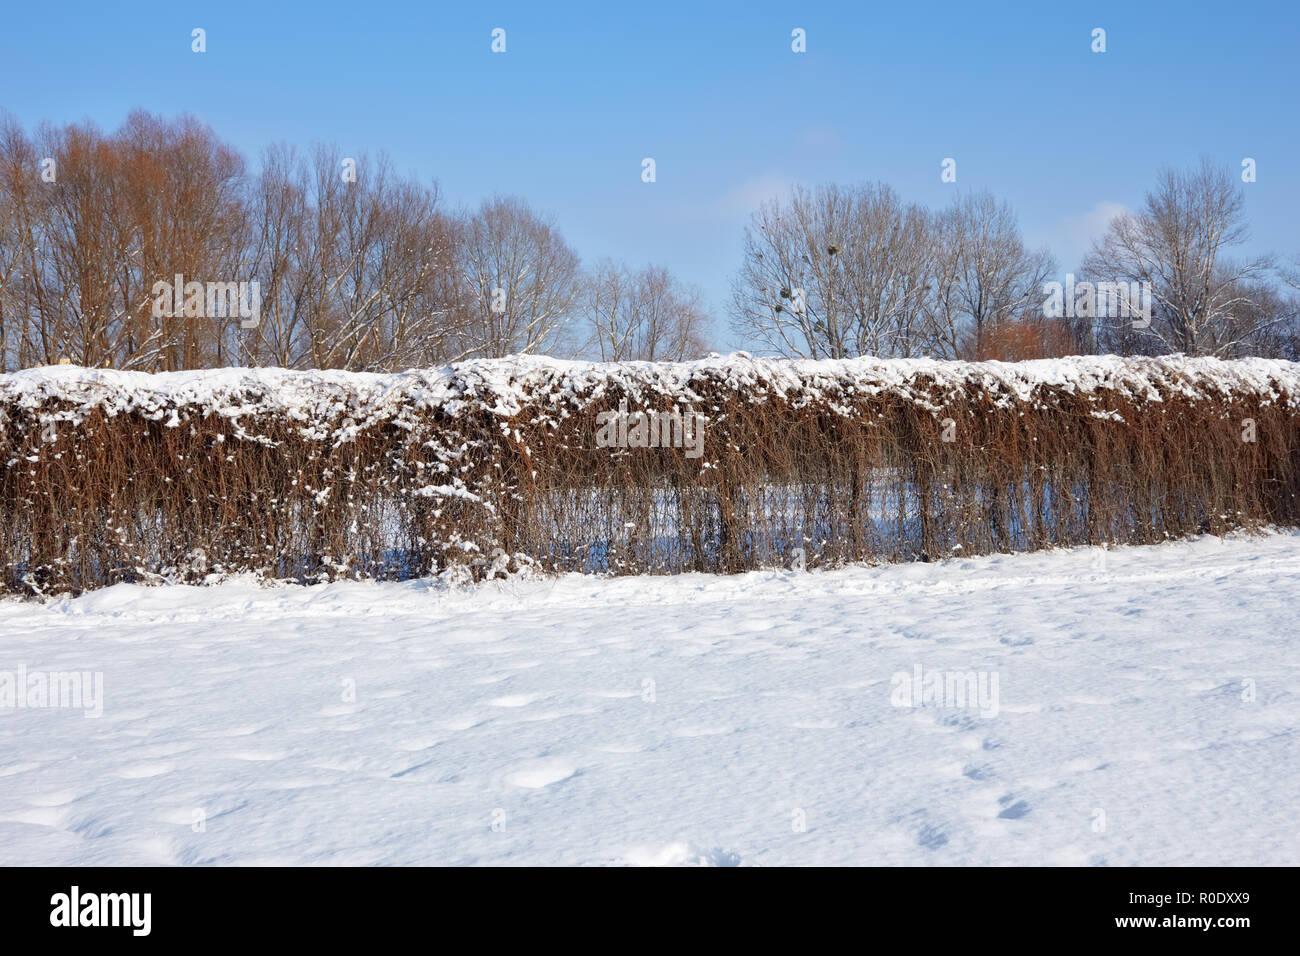 Living fence of dried lianas plants in winter park. Khmelnytsky, Ukraine - Stock Image